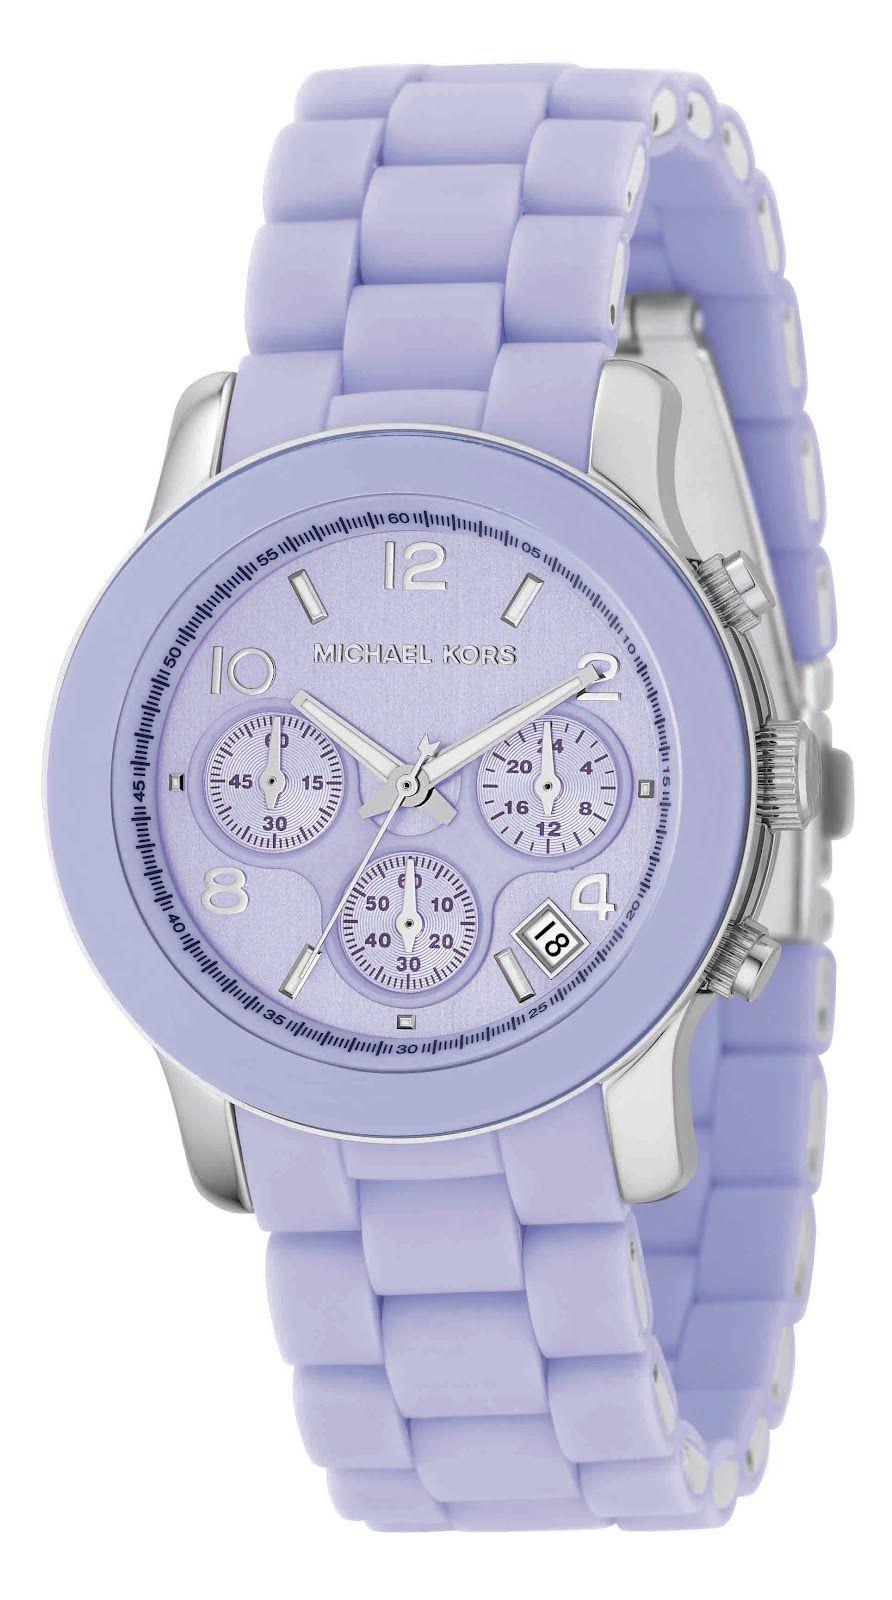 dc1cb3d4e325 Michael Kors Chrono Silicone Baby Blue Women s Watch MK-5234 ...